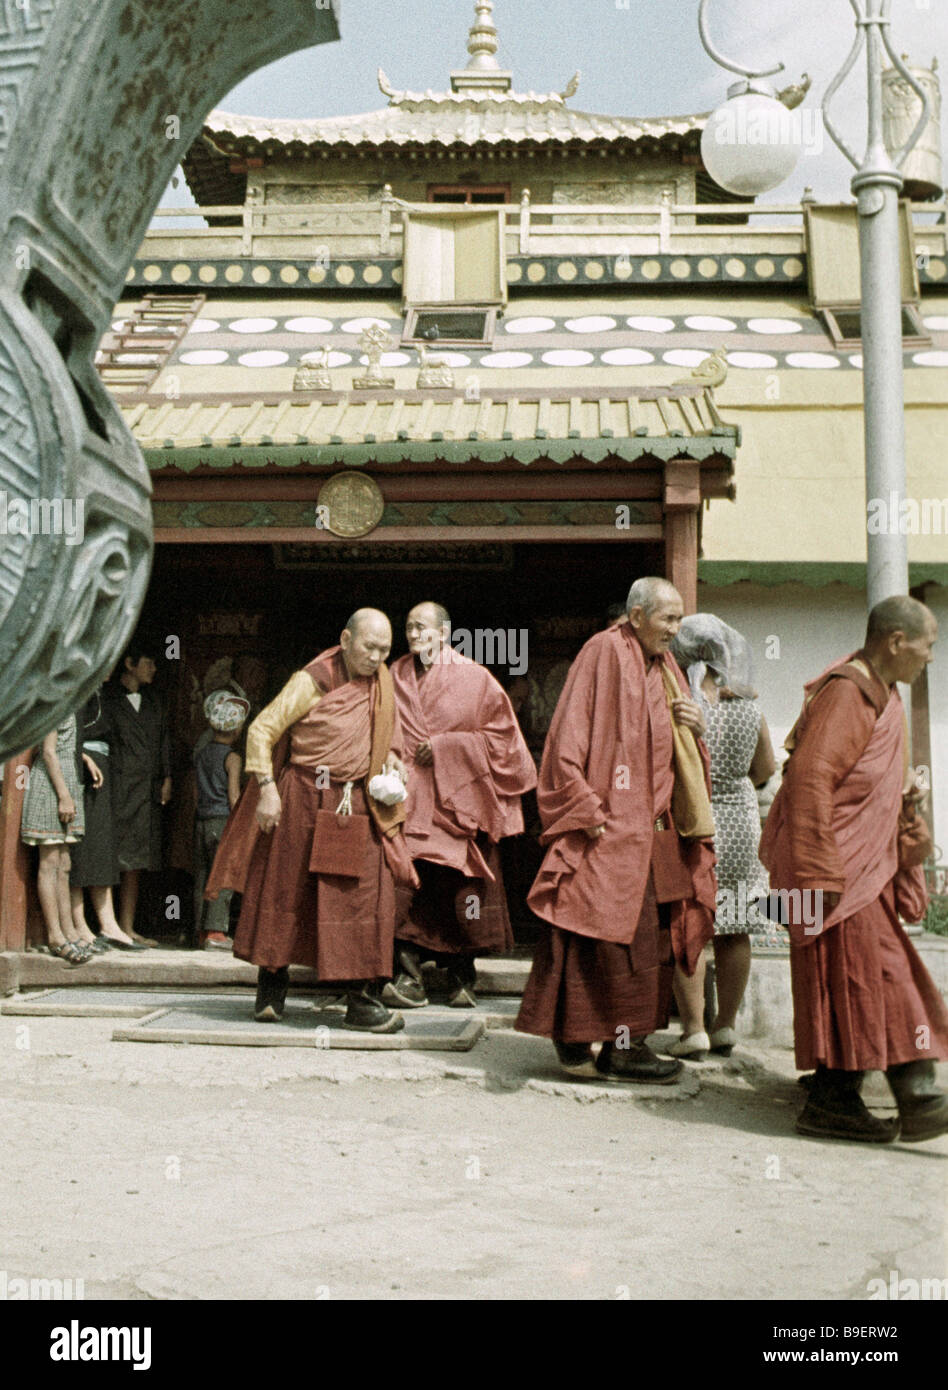 The Lama temple Gandan in Ulan Bator - Stock Image